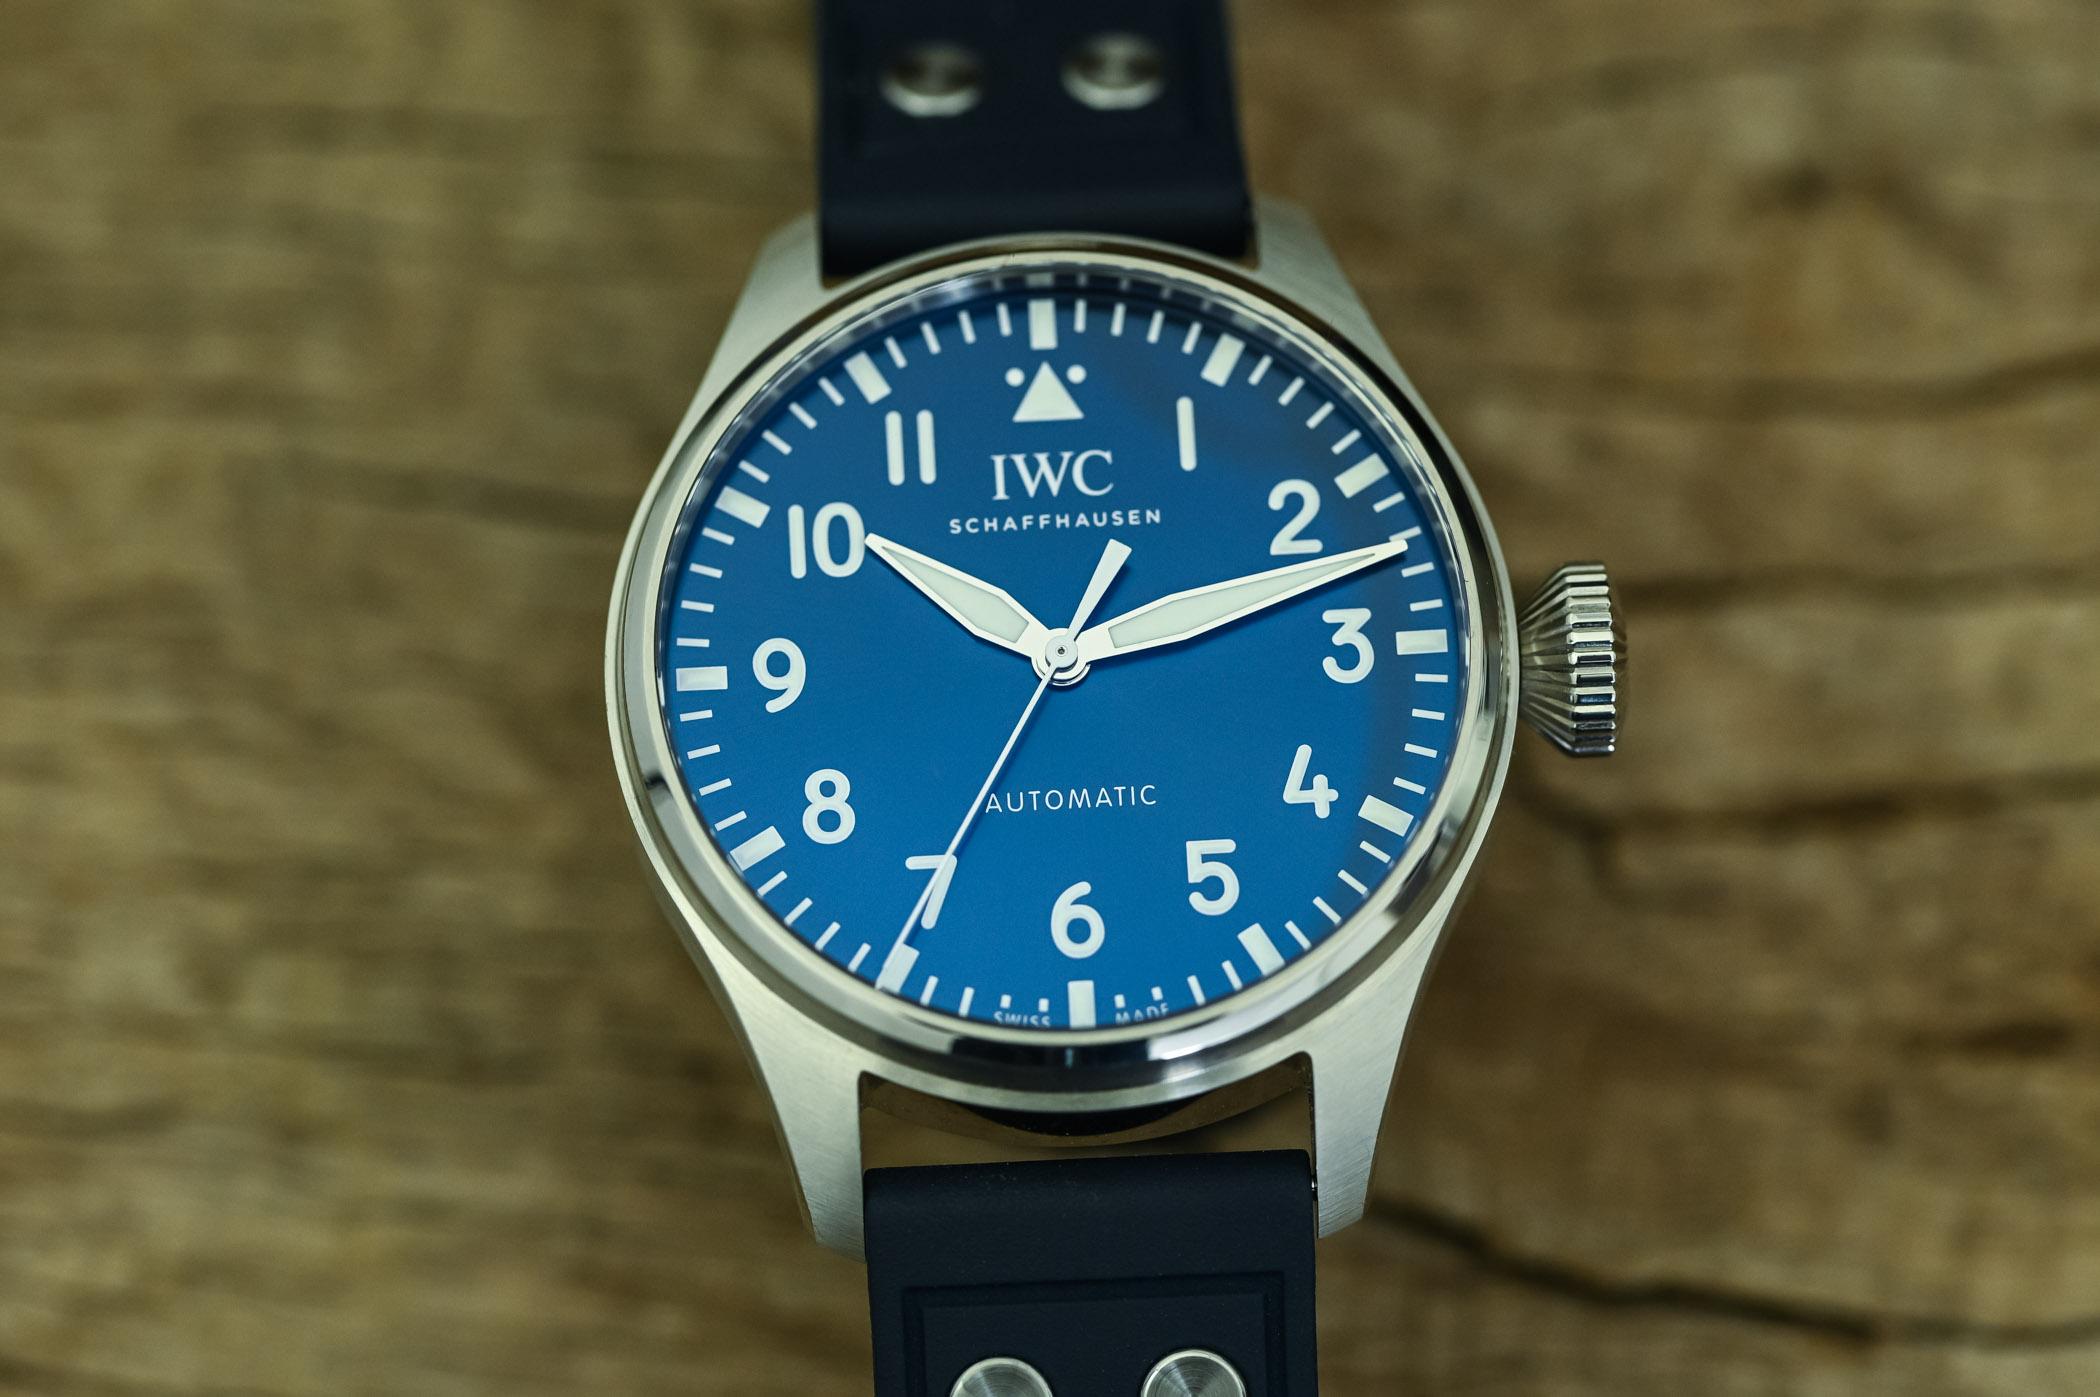 A Big Pilot Fan Take on The New IWC Big Pilots Watch 43